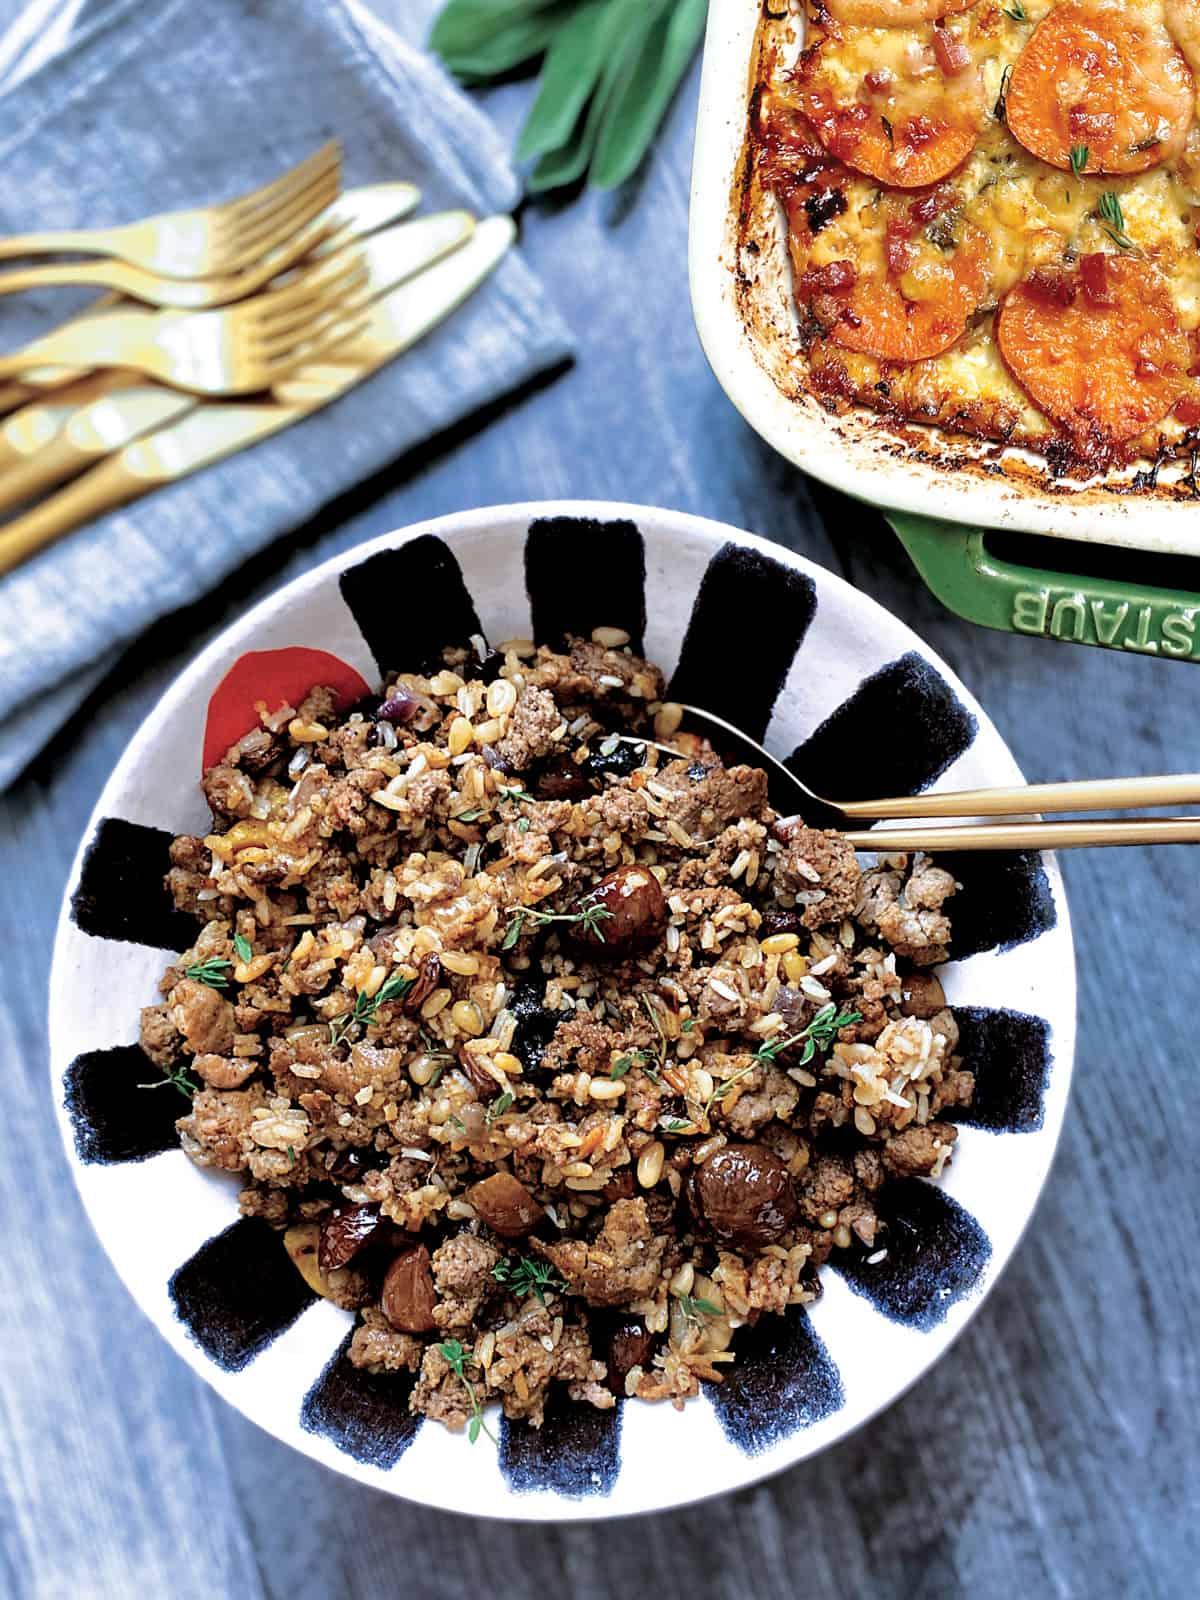 A bowl with turkey stuffing next to a sweet potato gratin.